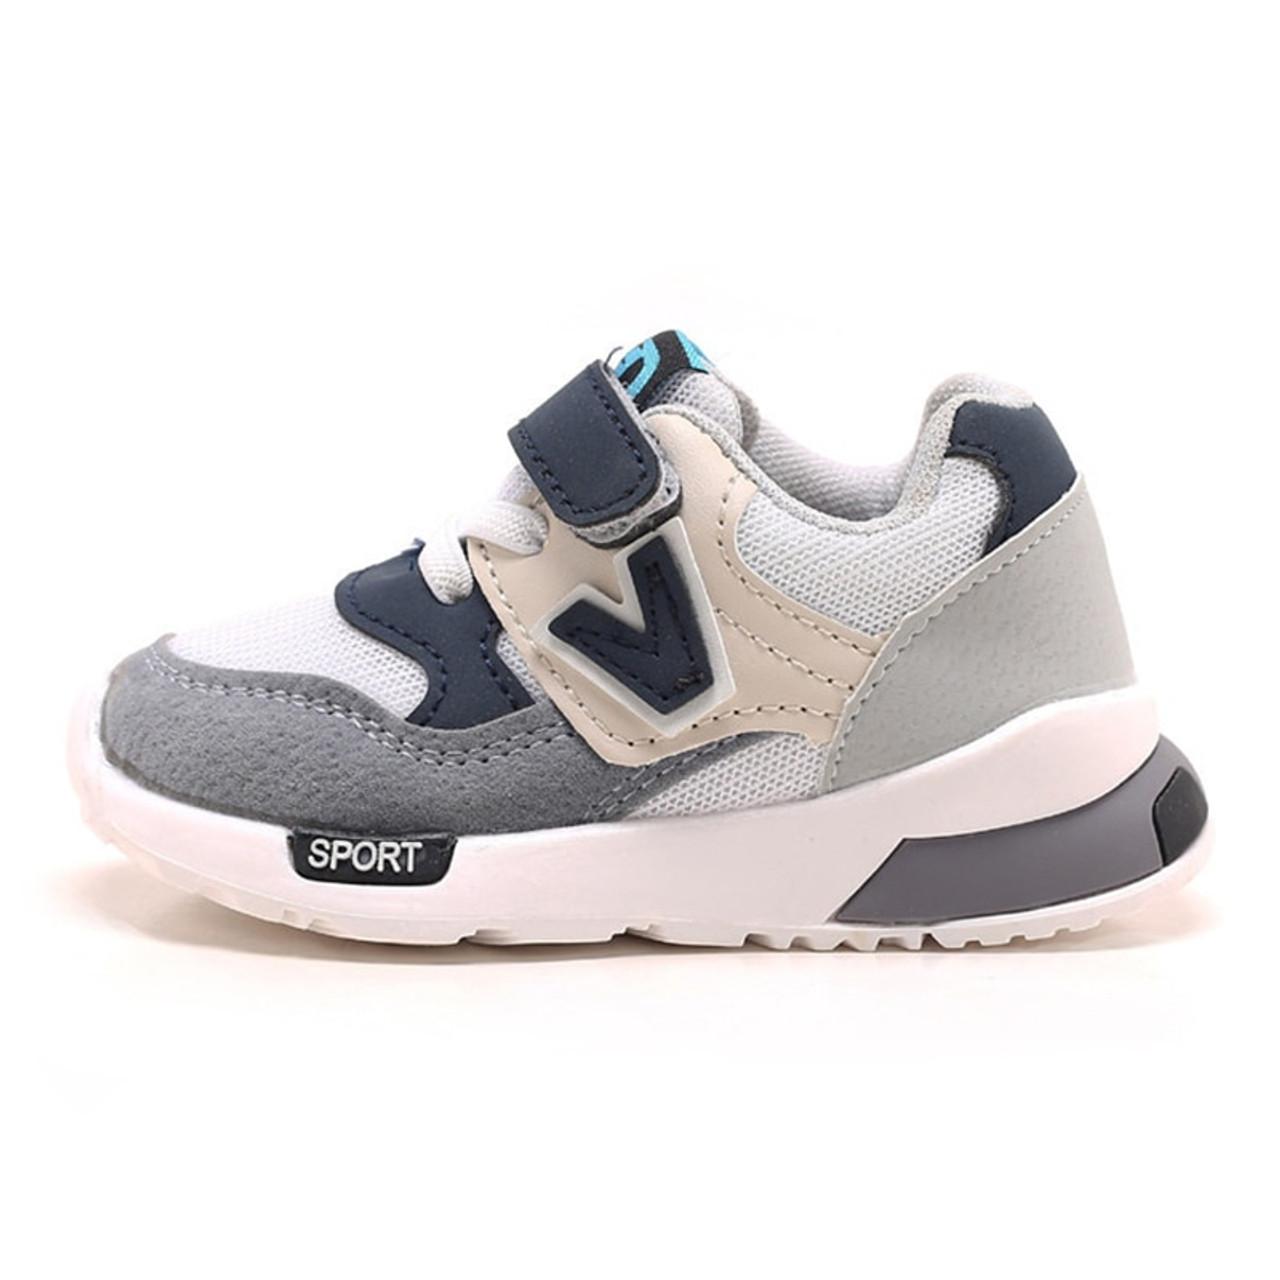 COZULMA Baby Kids Shoes Sneakers Kids